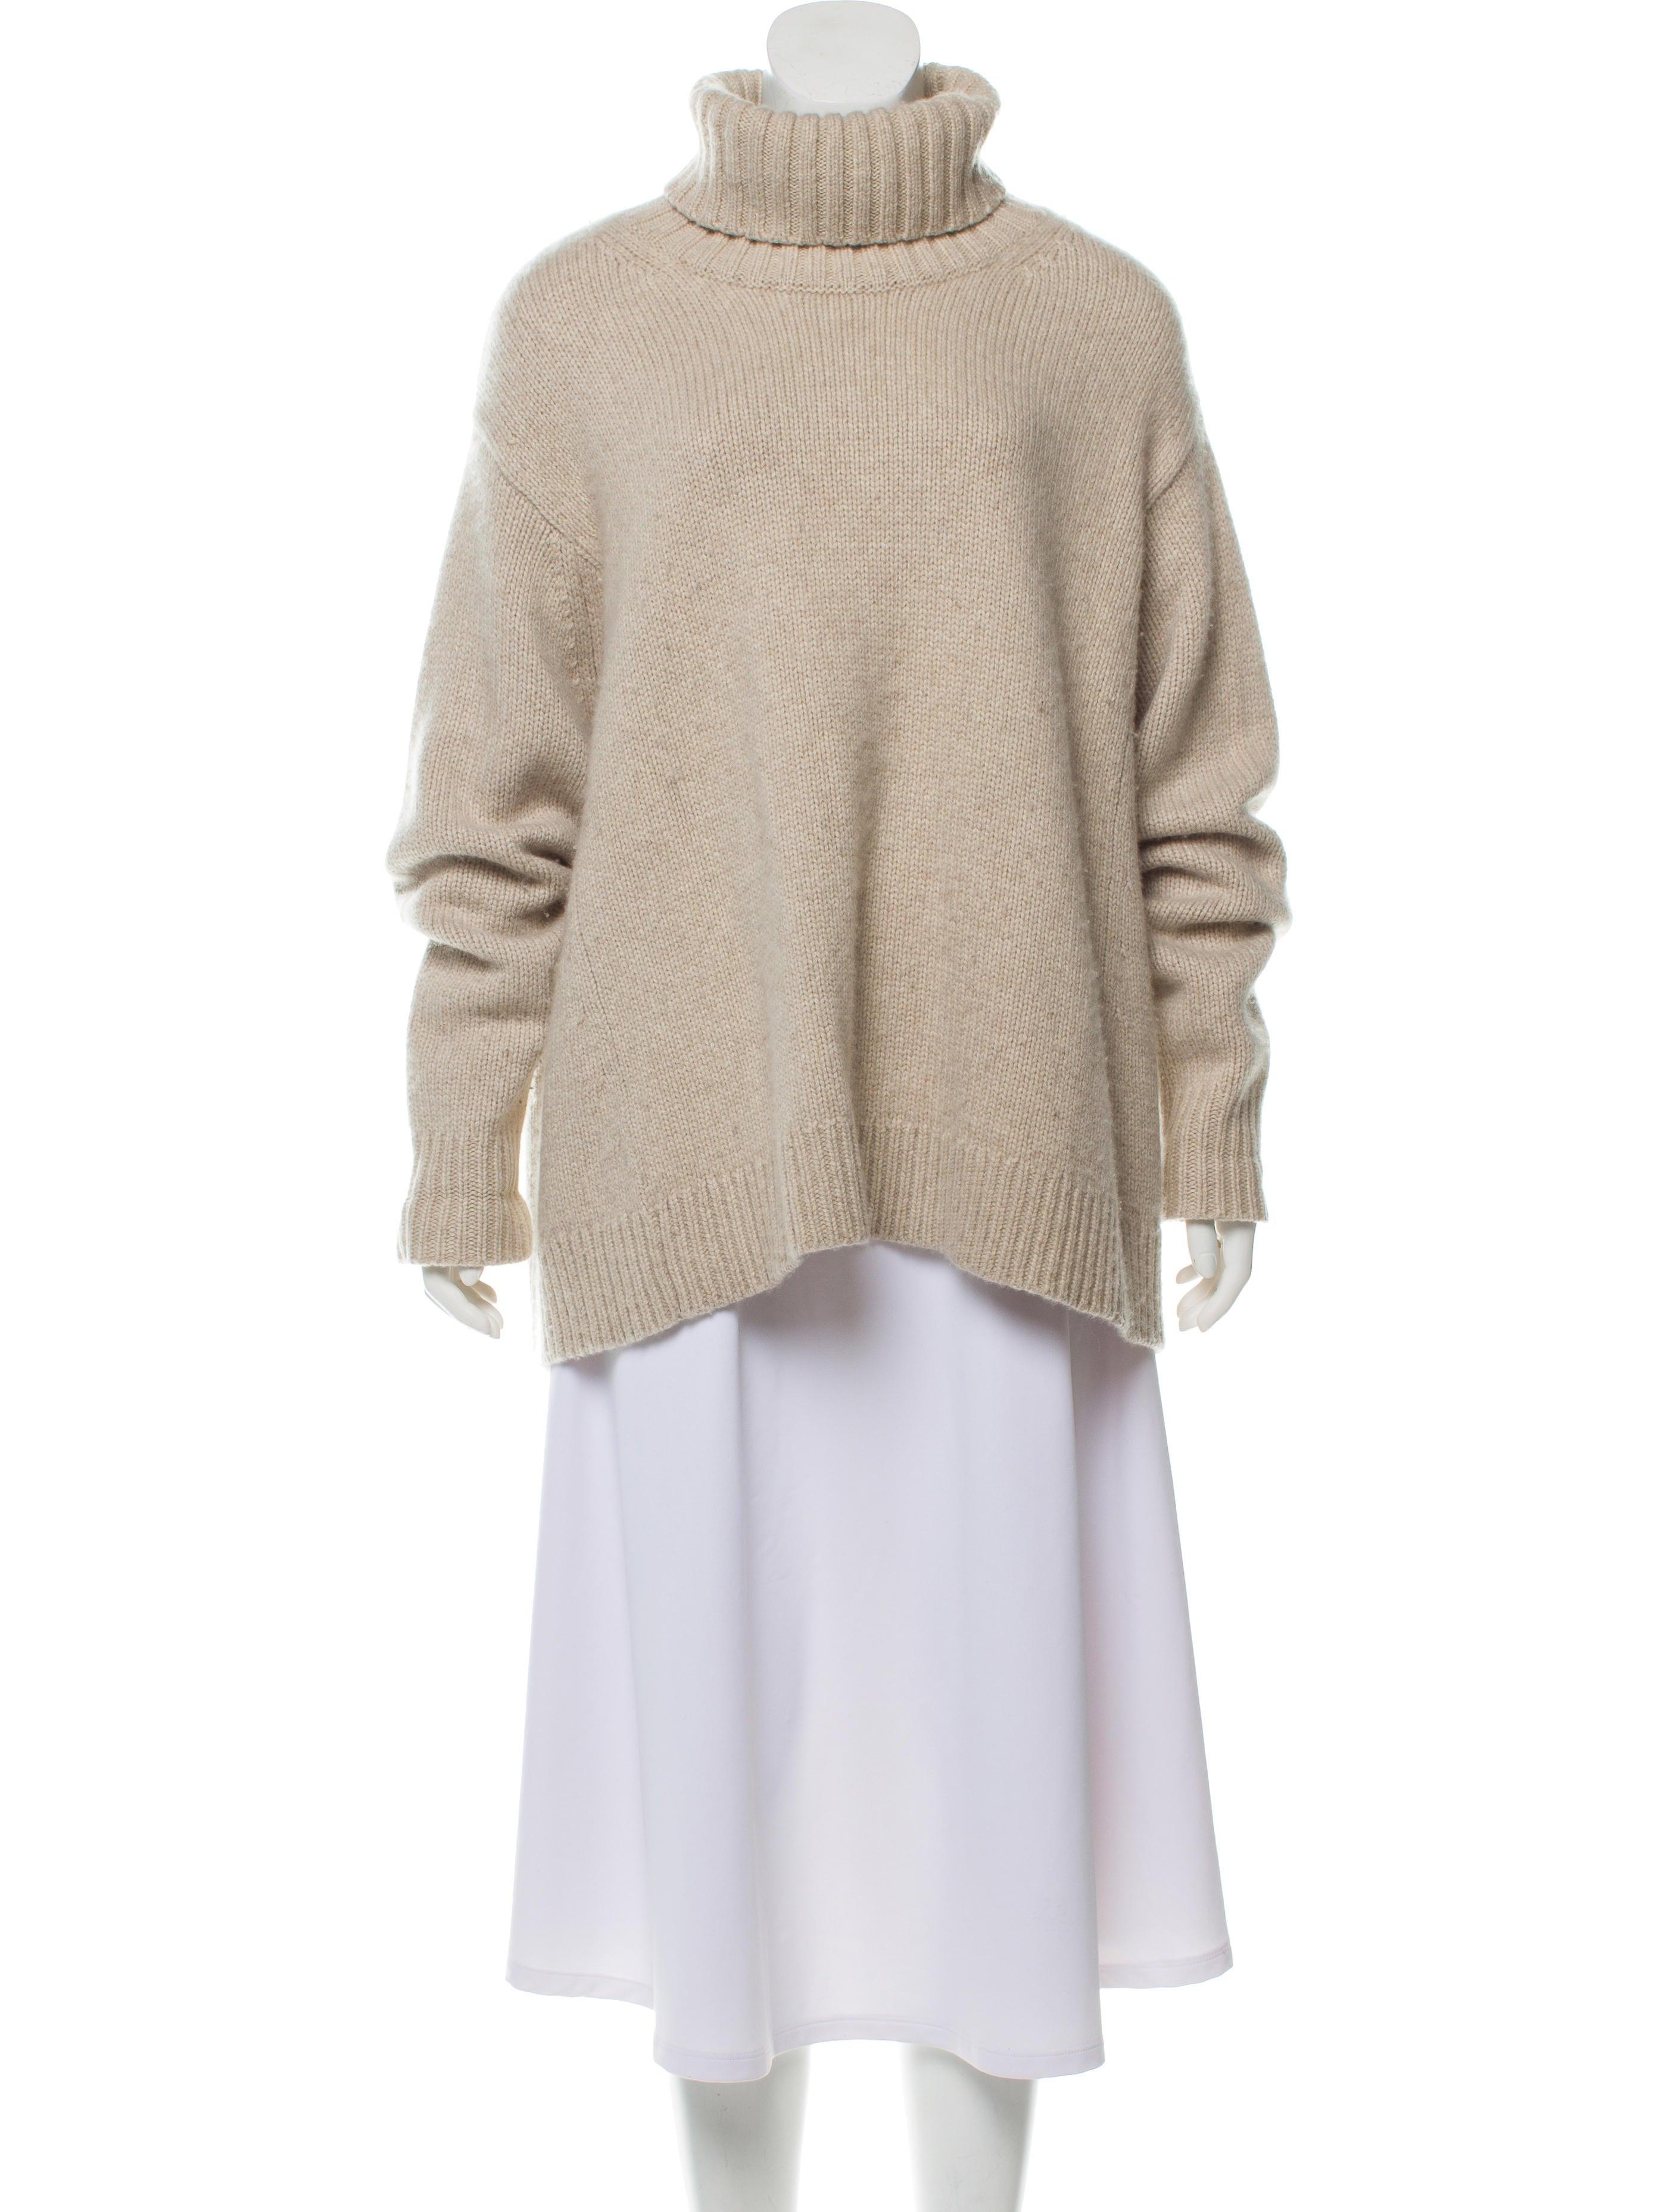 Heavyweight Turtleneck Cashmere Sweater by Celine